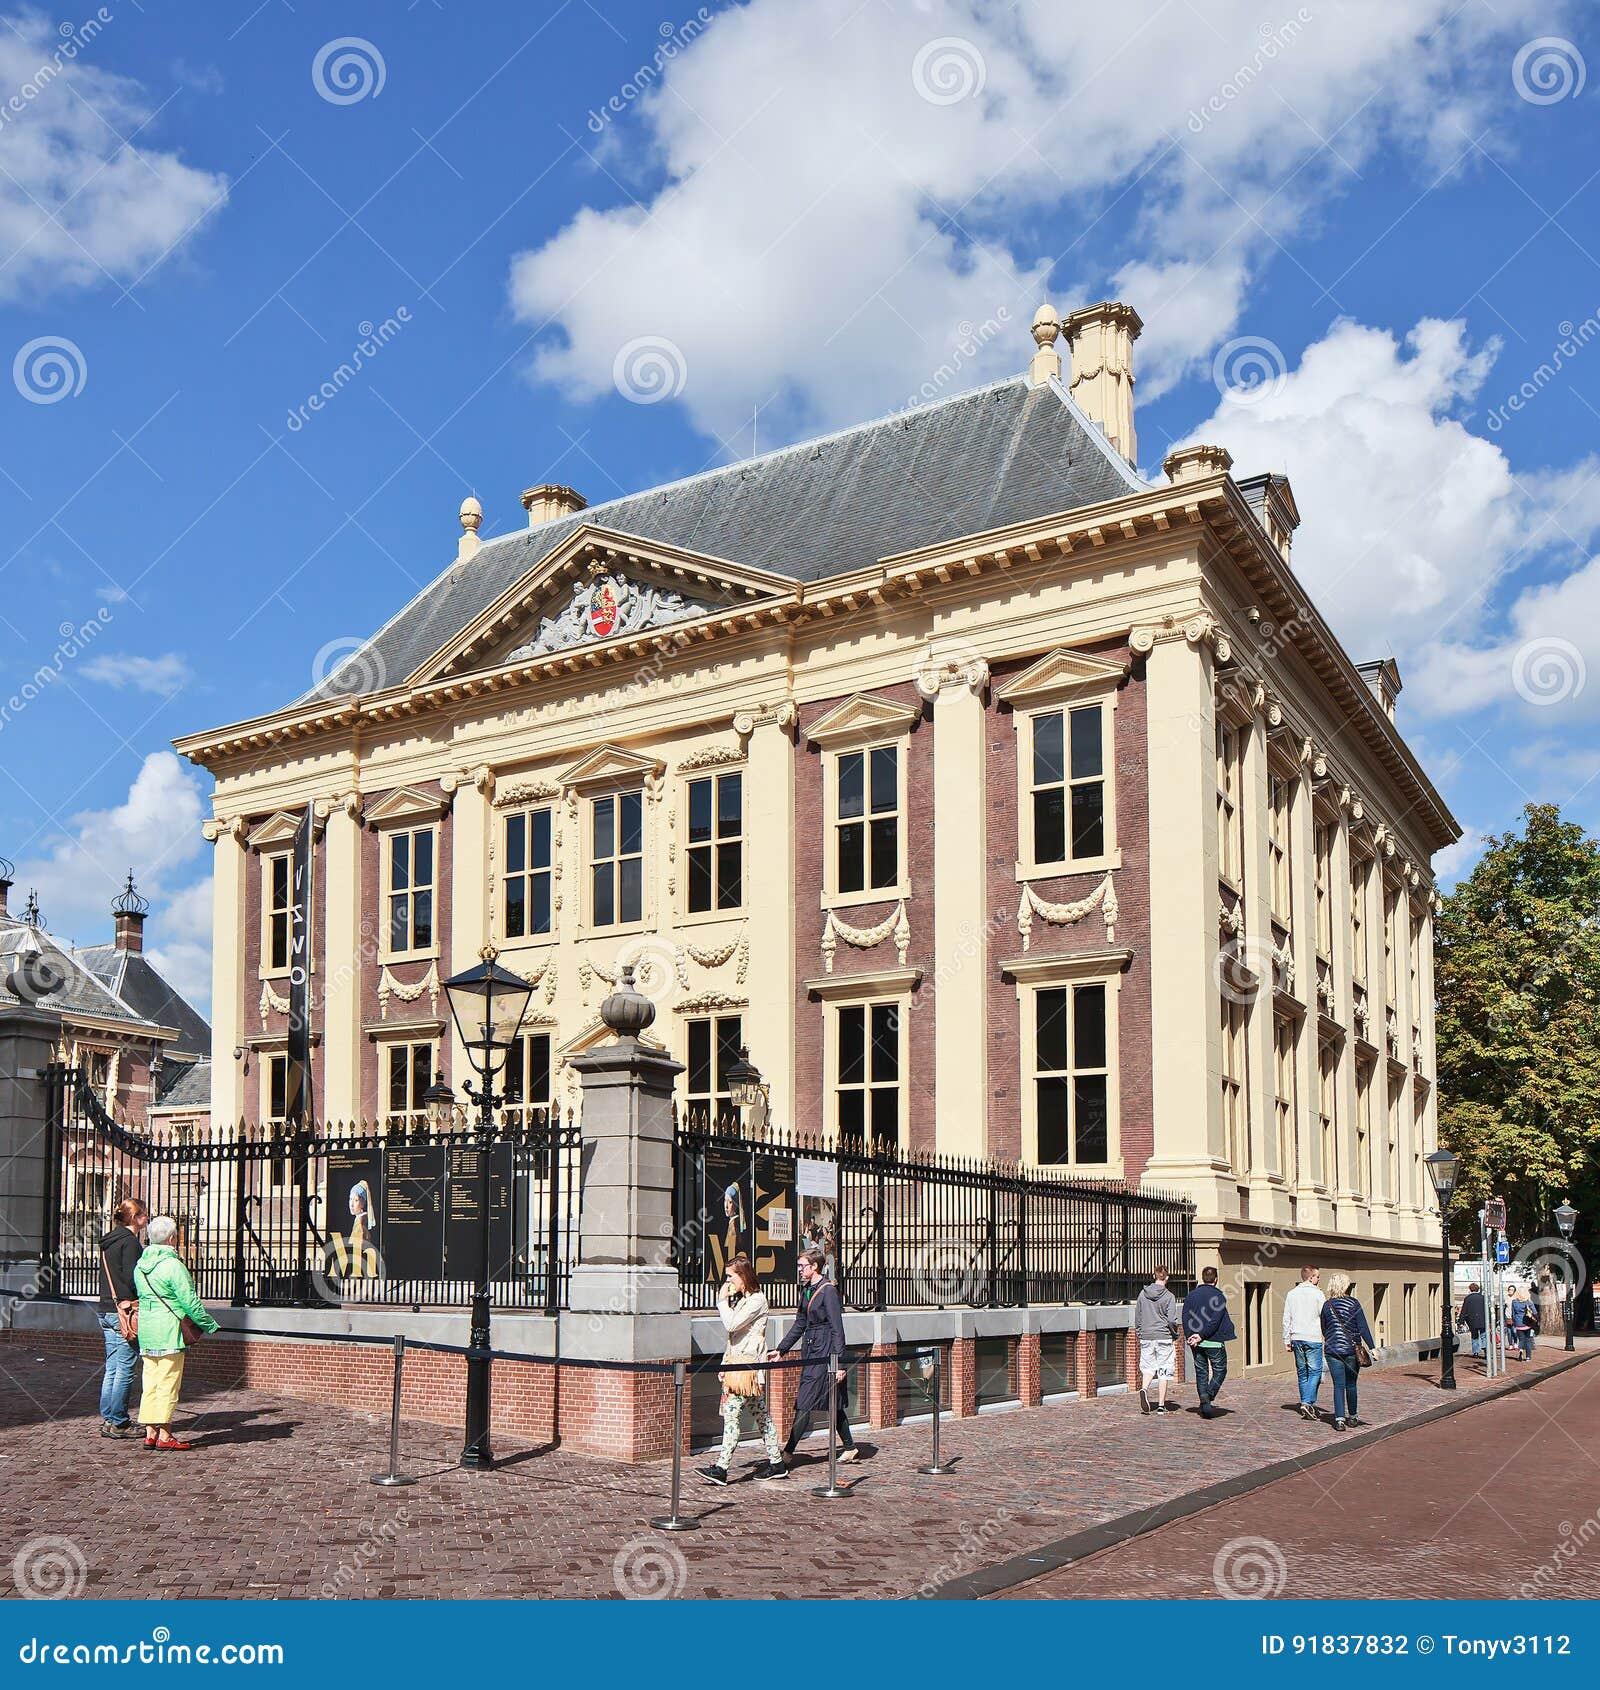 Maurits房子,美术馆,海牙,荷兰